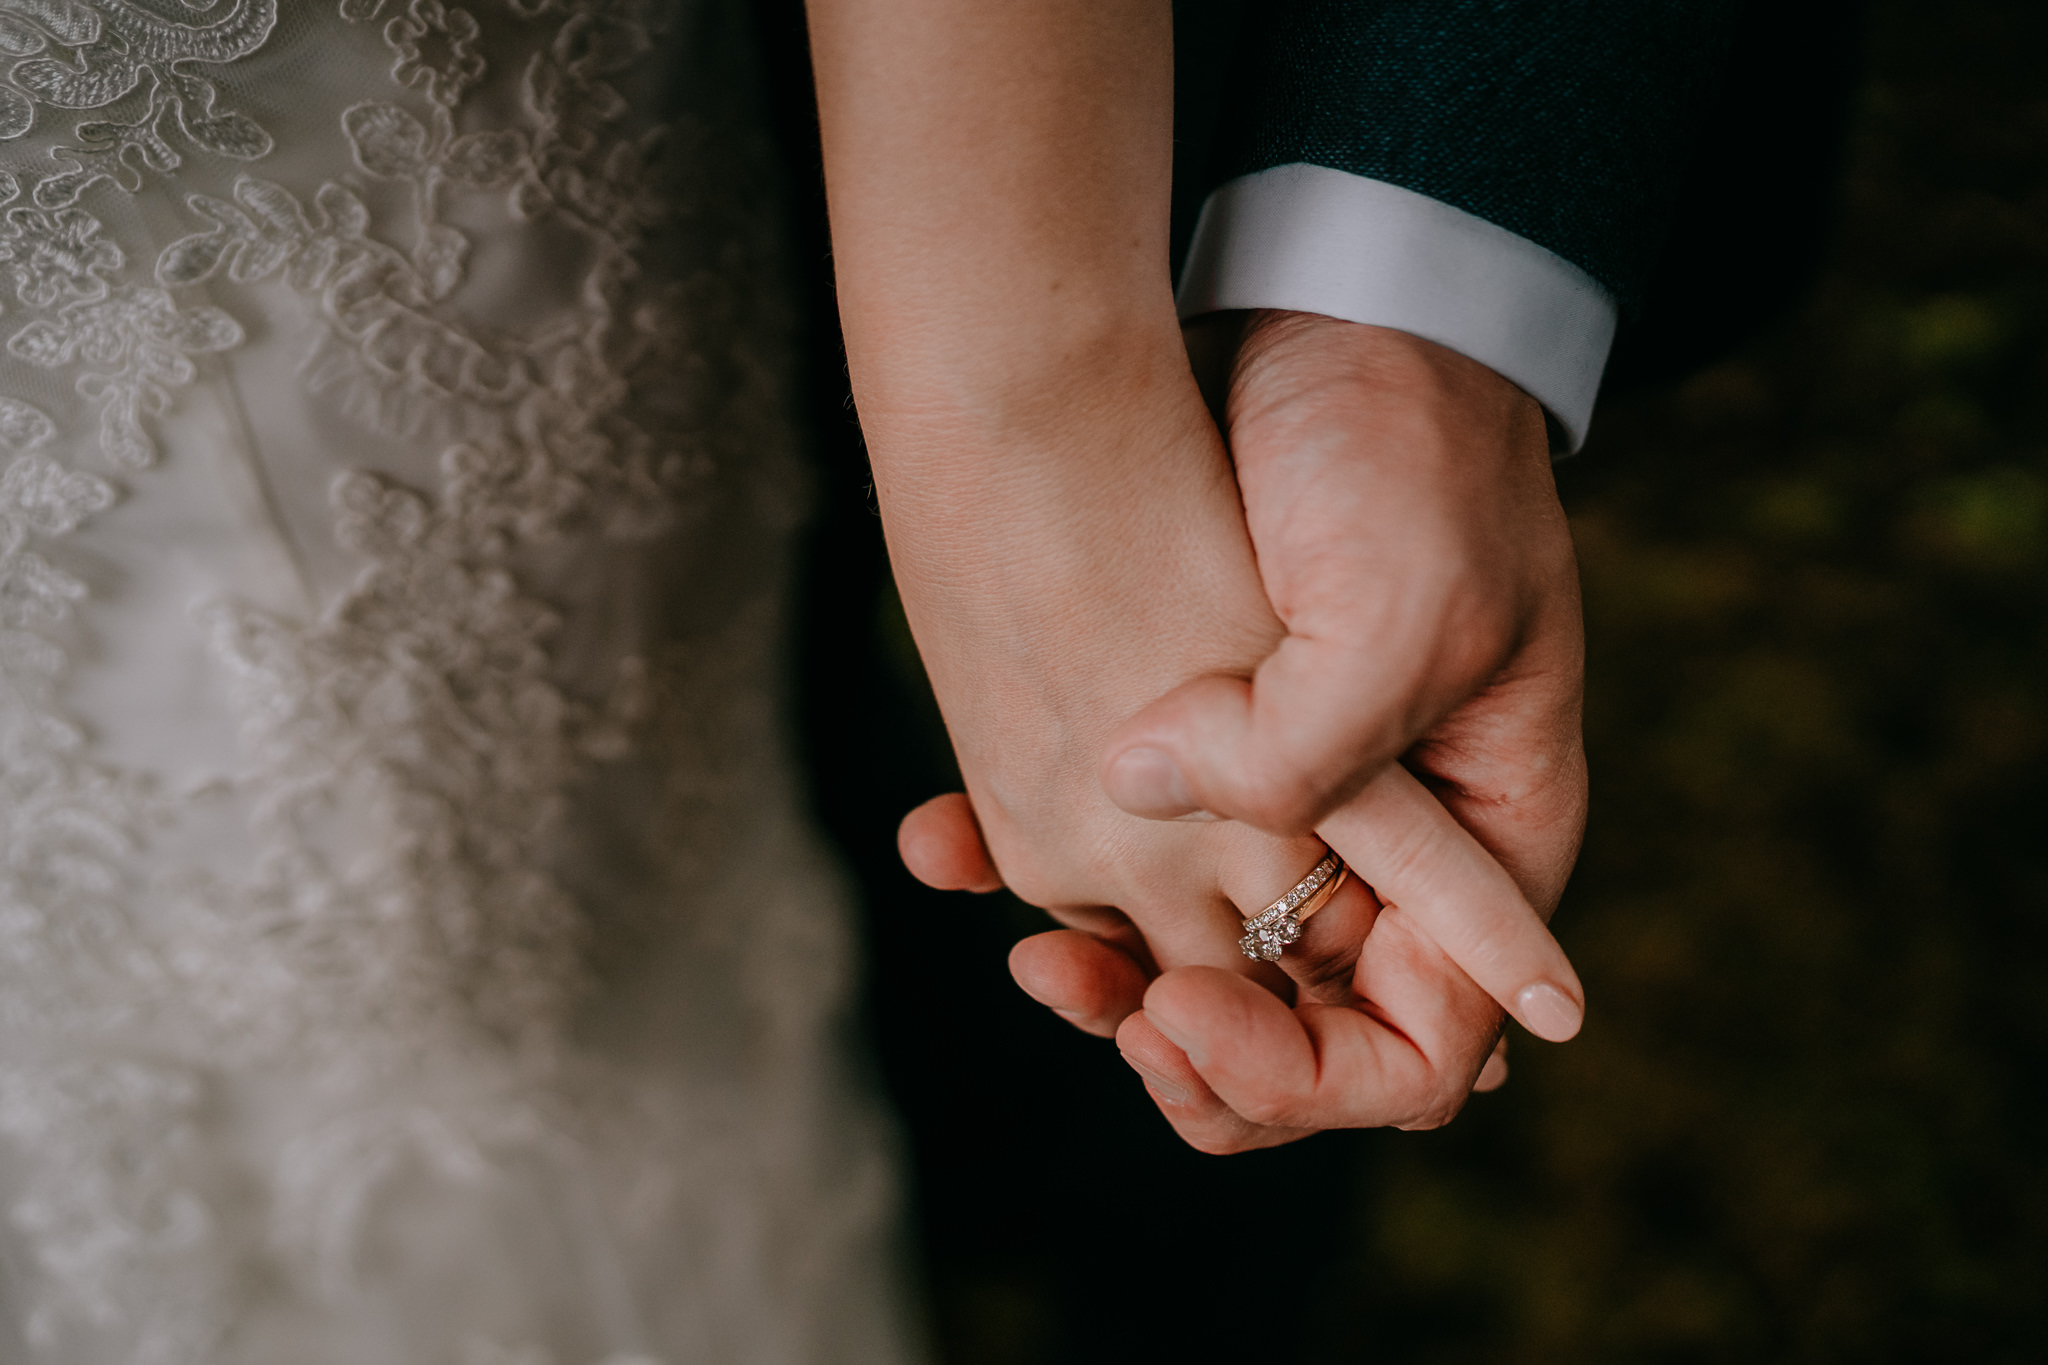 Northern-Ireland-wedding-photographers-the-martins-outdoor-barn-wedding-132.jpg